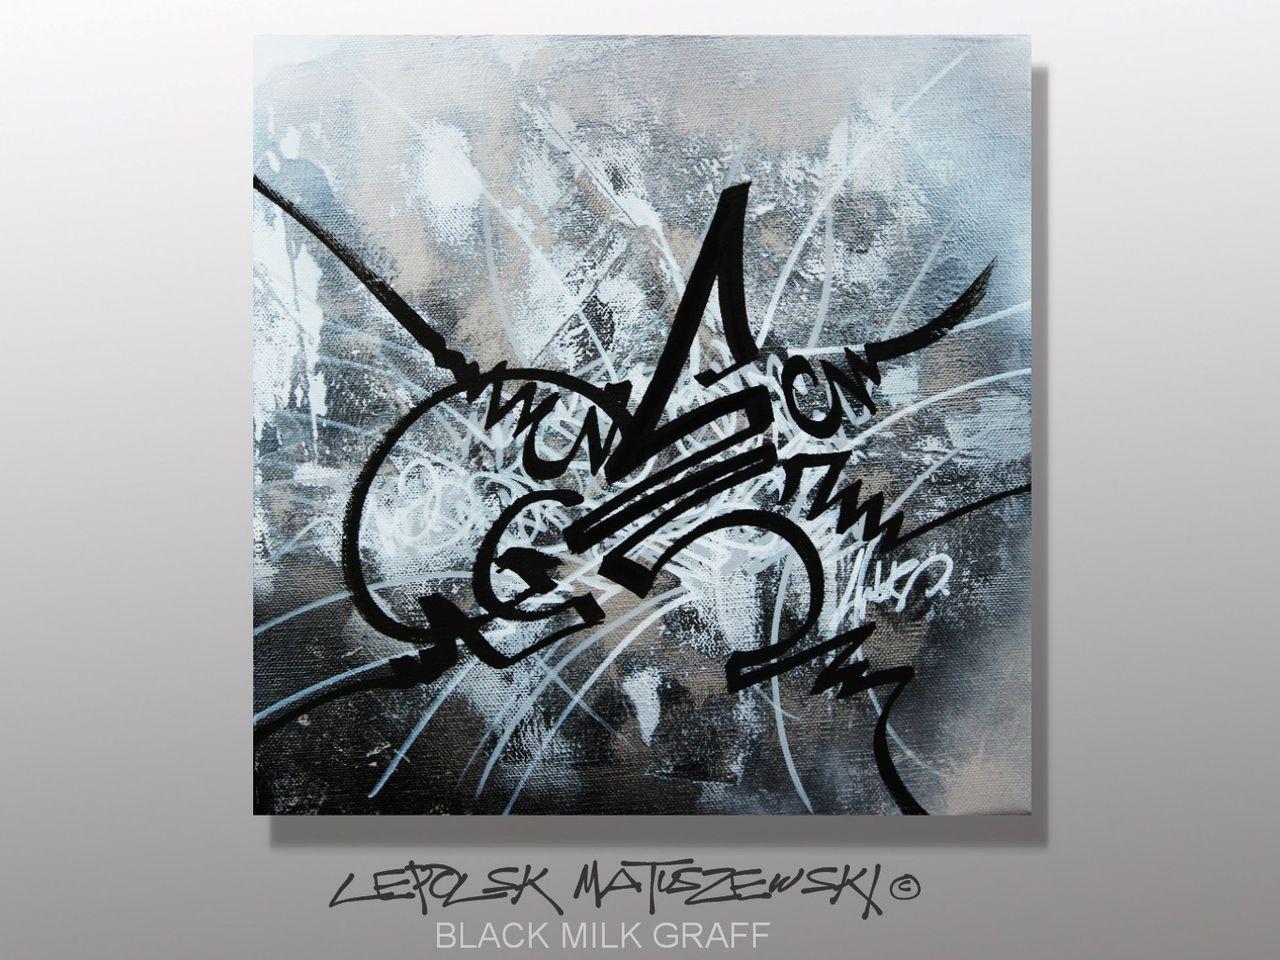 MK  Lepolsk Matuszewski BLACK MILK GRAFF